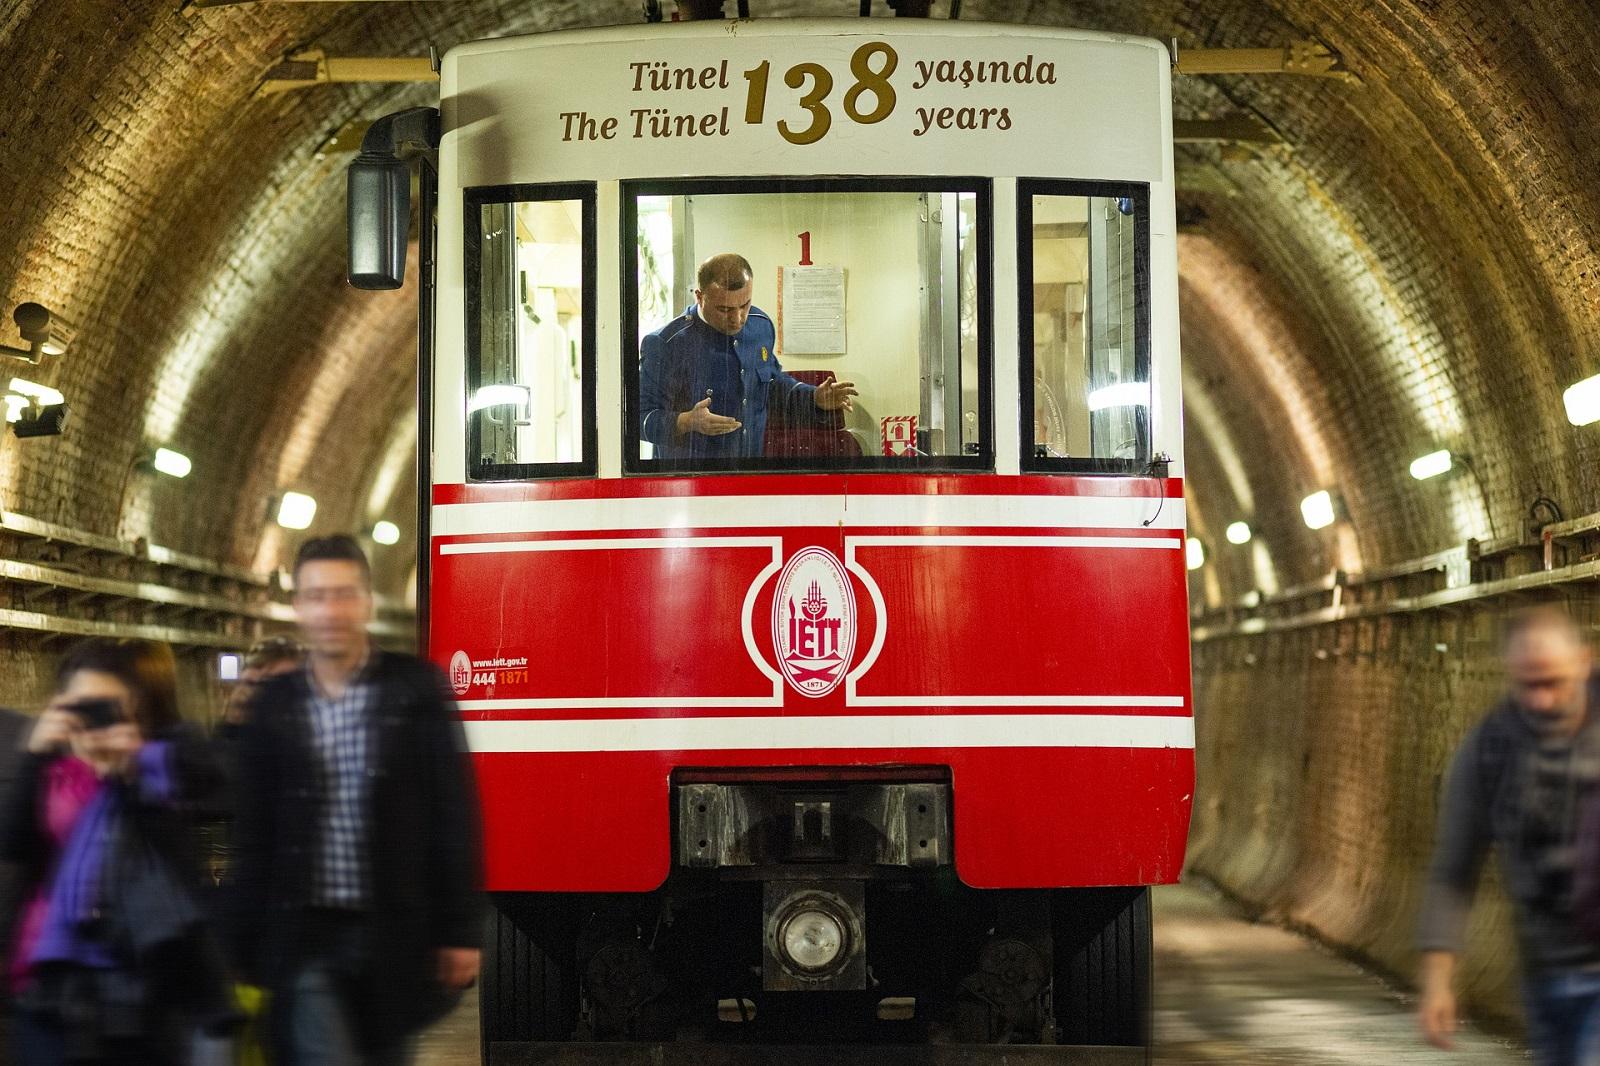 tunel istanbul